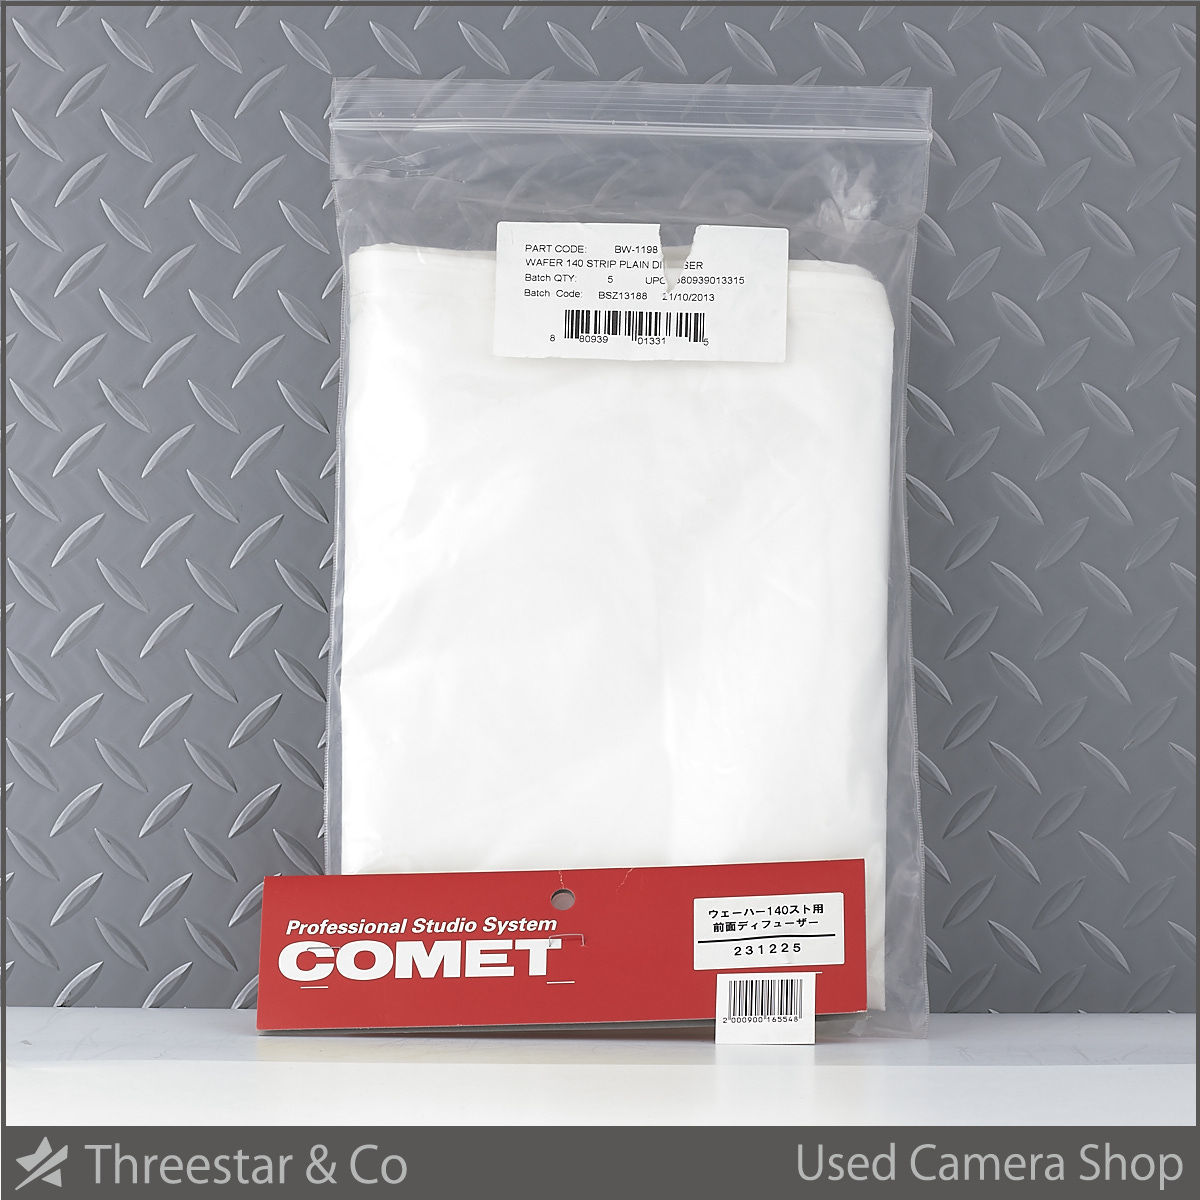 COMET コメット BW-1198 WAFER 140 ストリップ用 フロントディフューザー 中古 ウェーハー 【5】